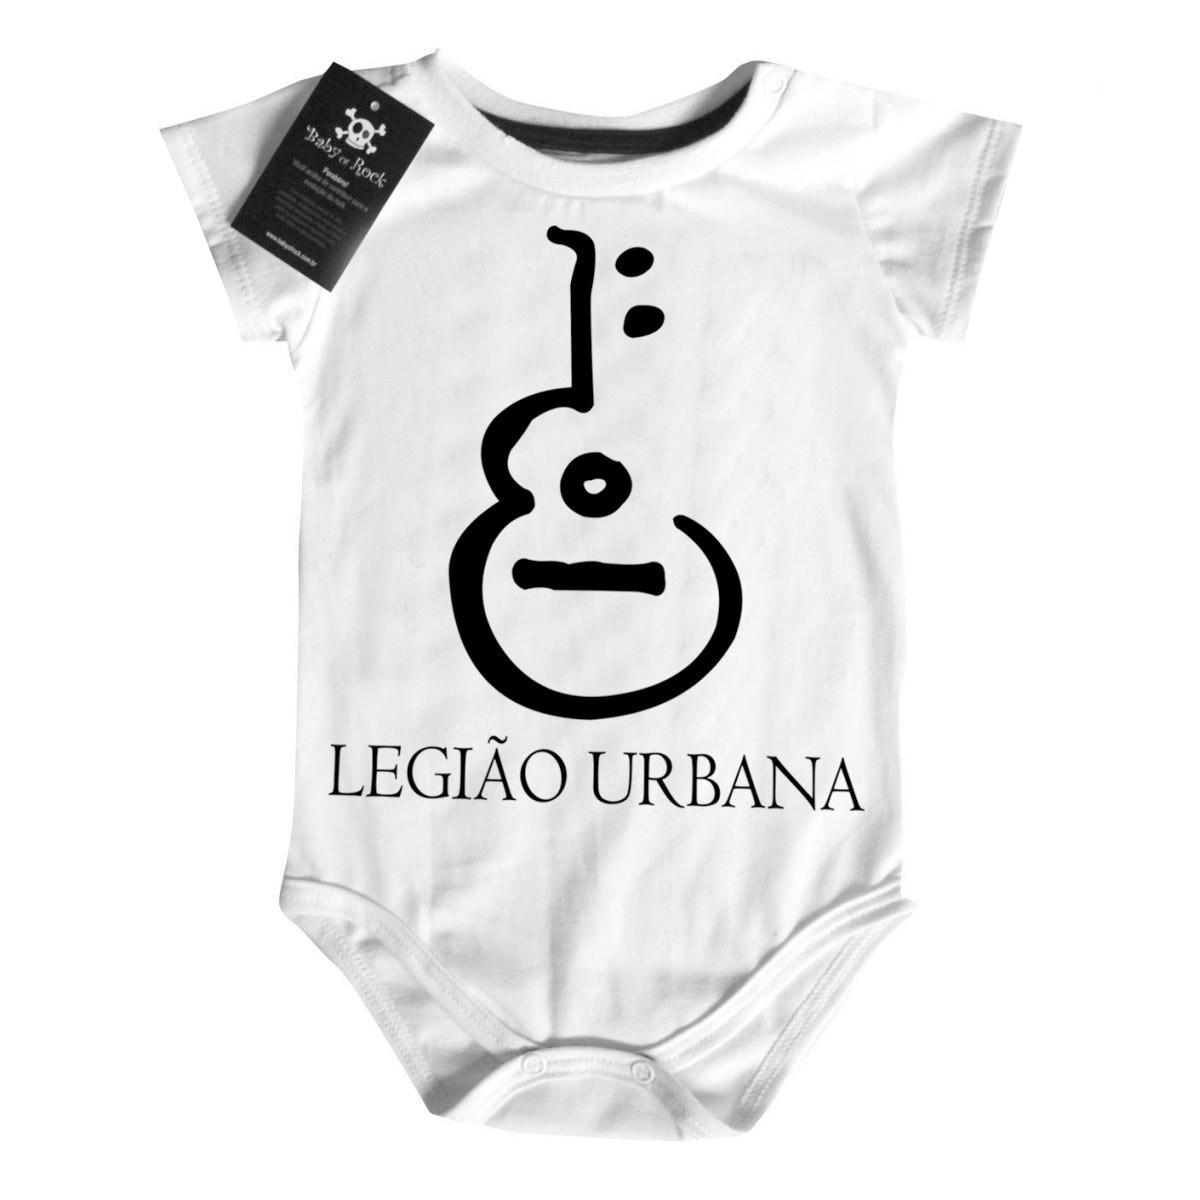 Body Rock Baby Nacional - Legião Urbana - White  - Baby Monster S/A